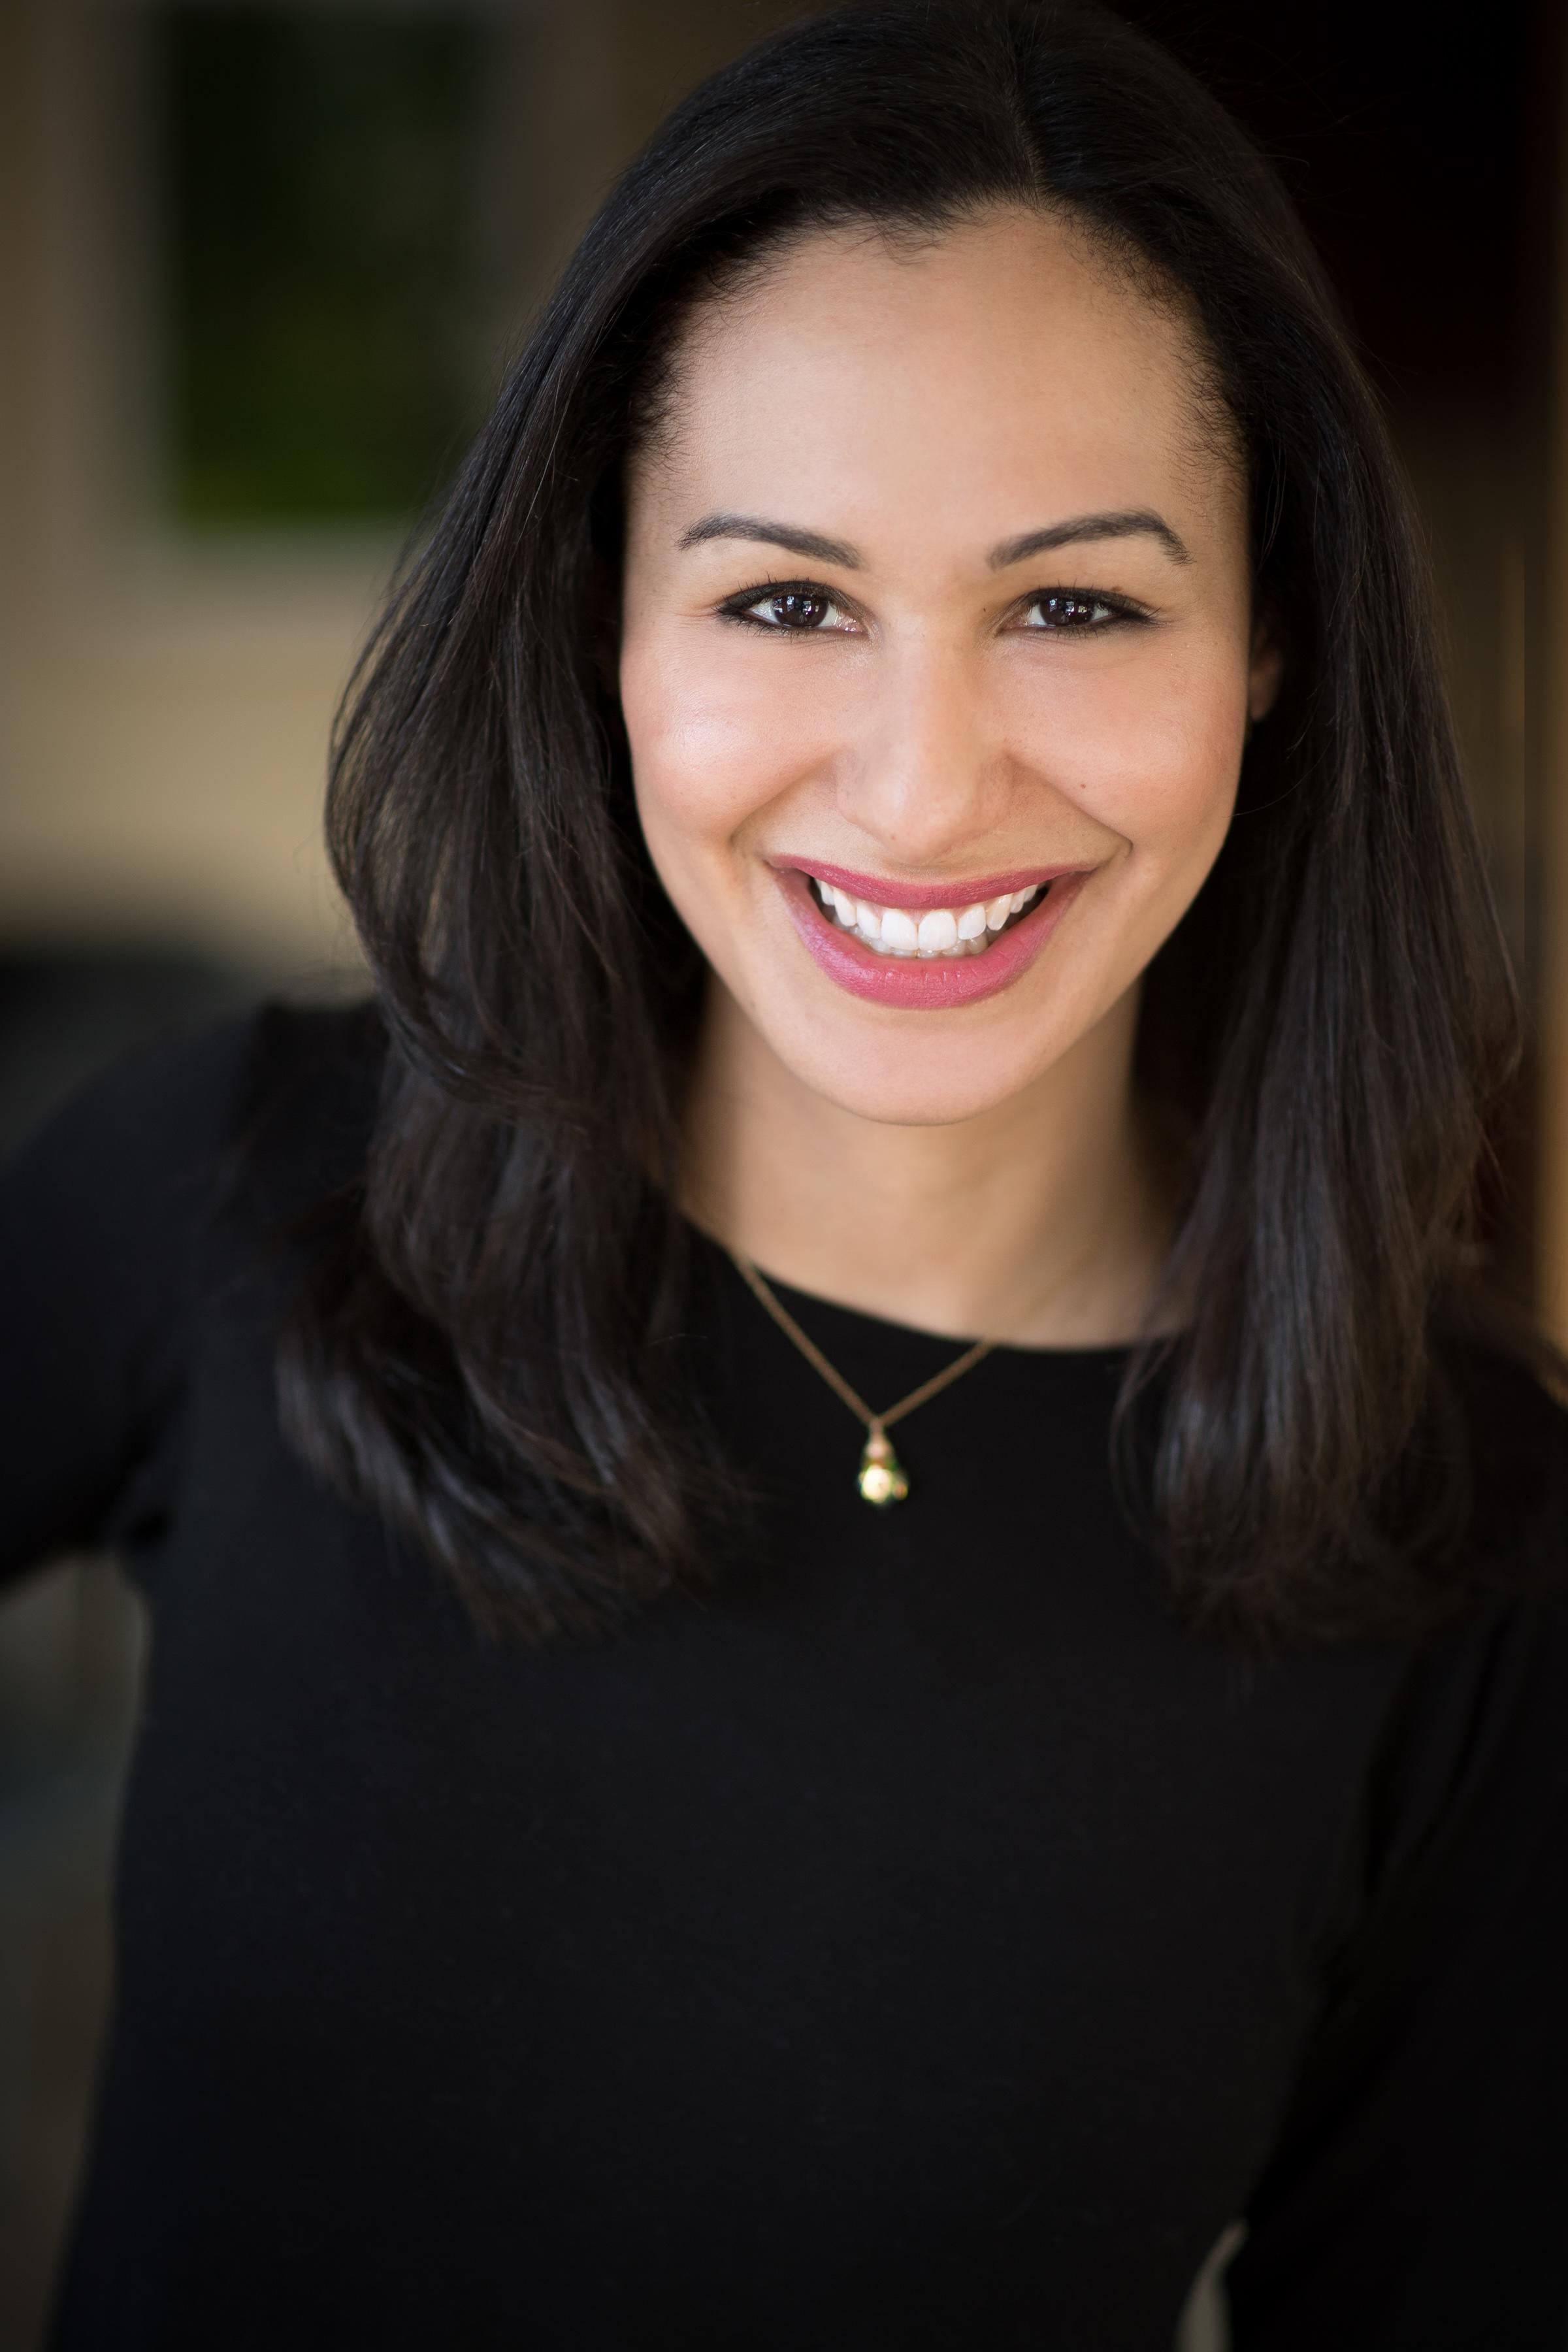 Ms. Rebecca Marcus